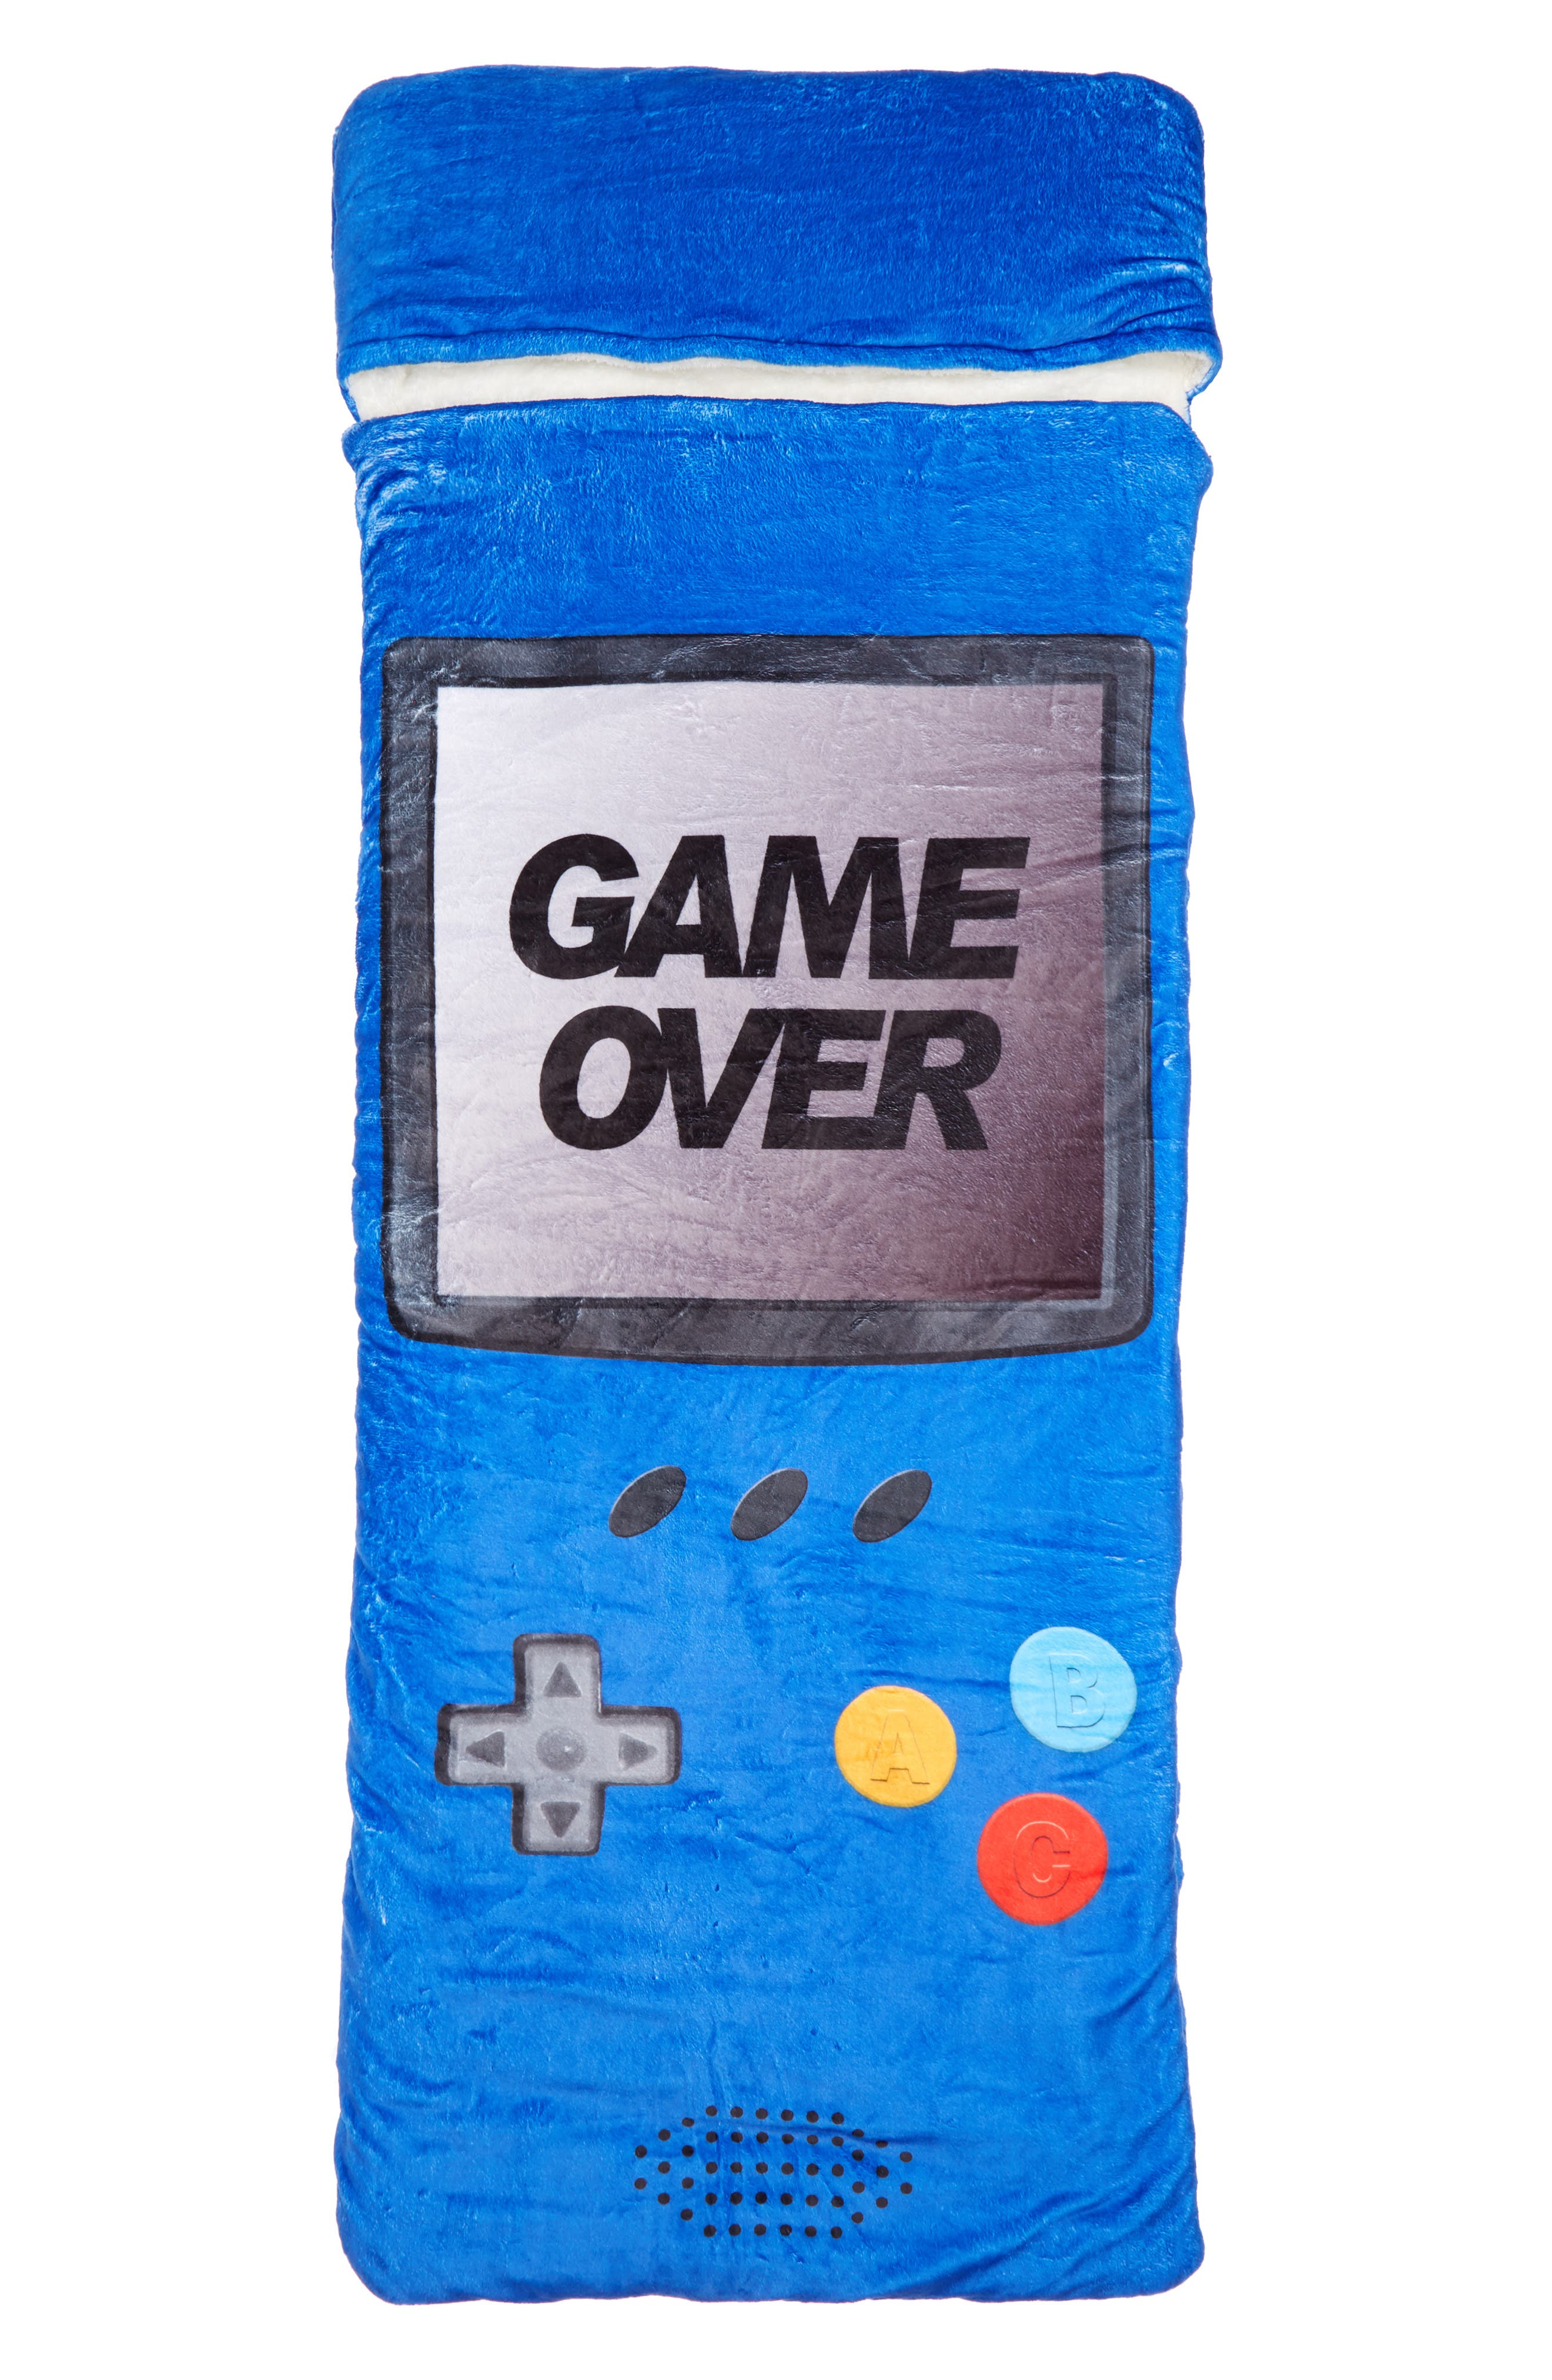 Iscream Game Over Sleeping Bag (Kids)